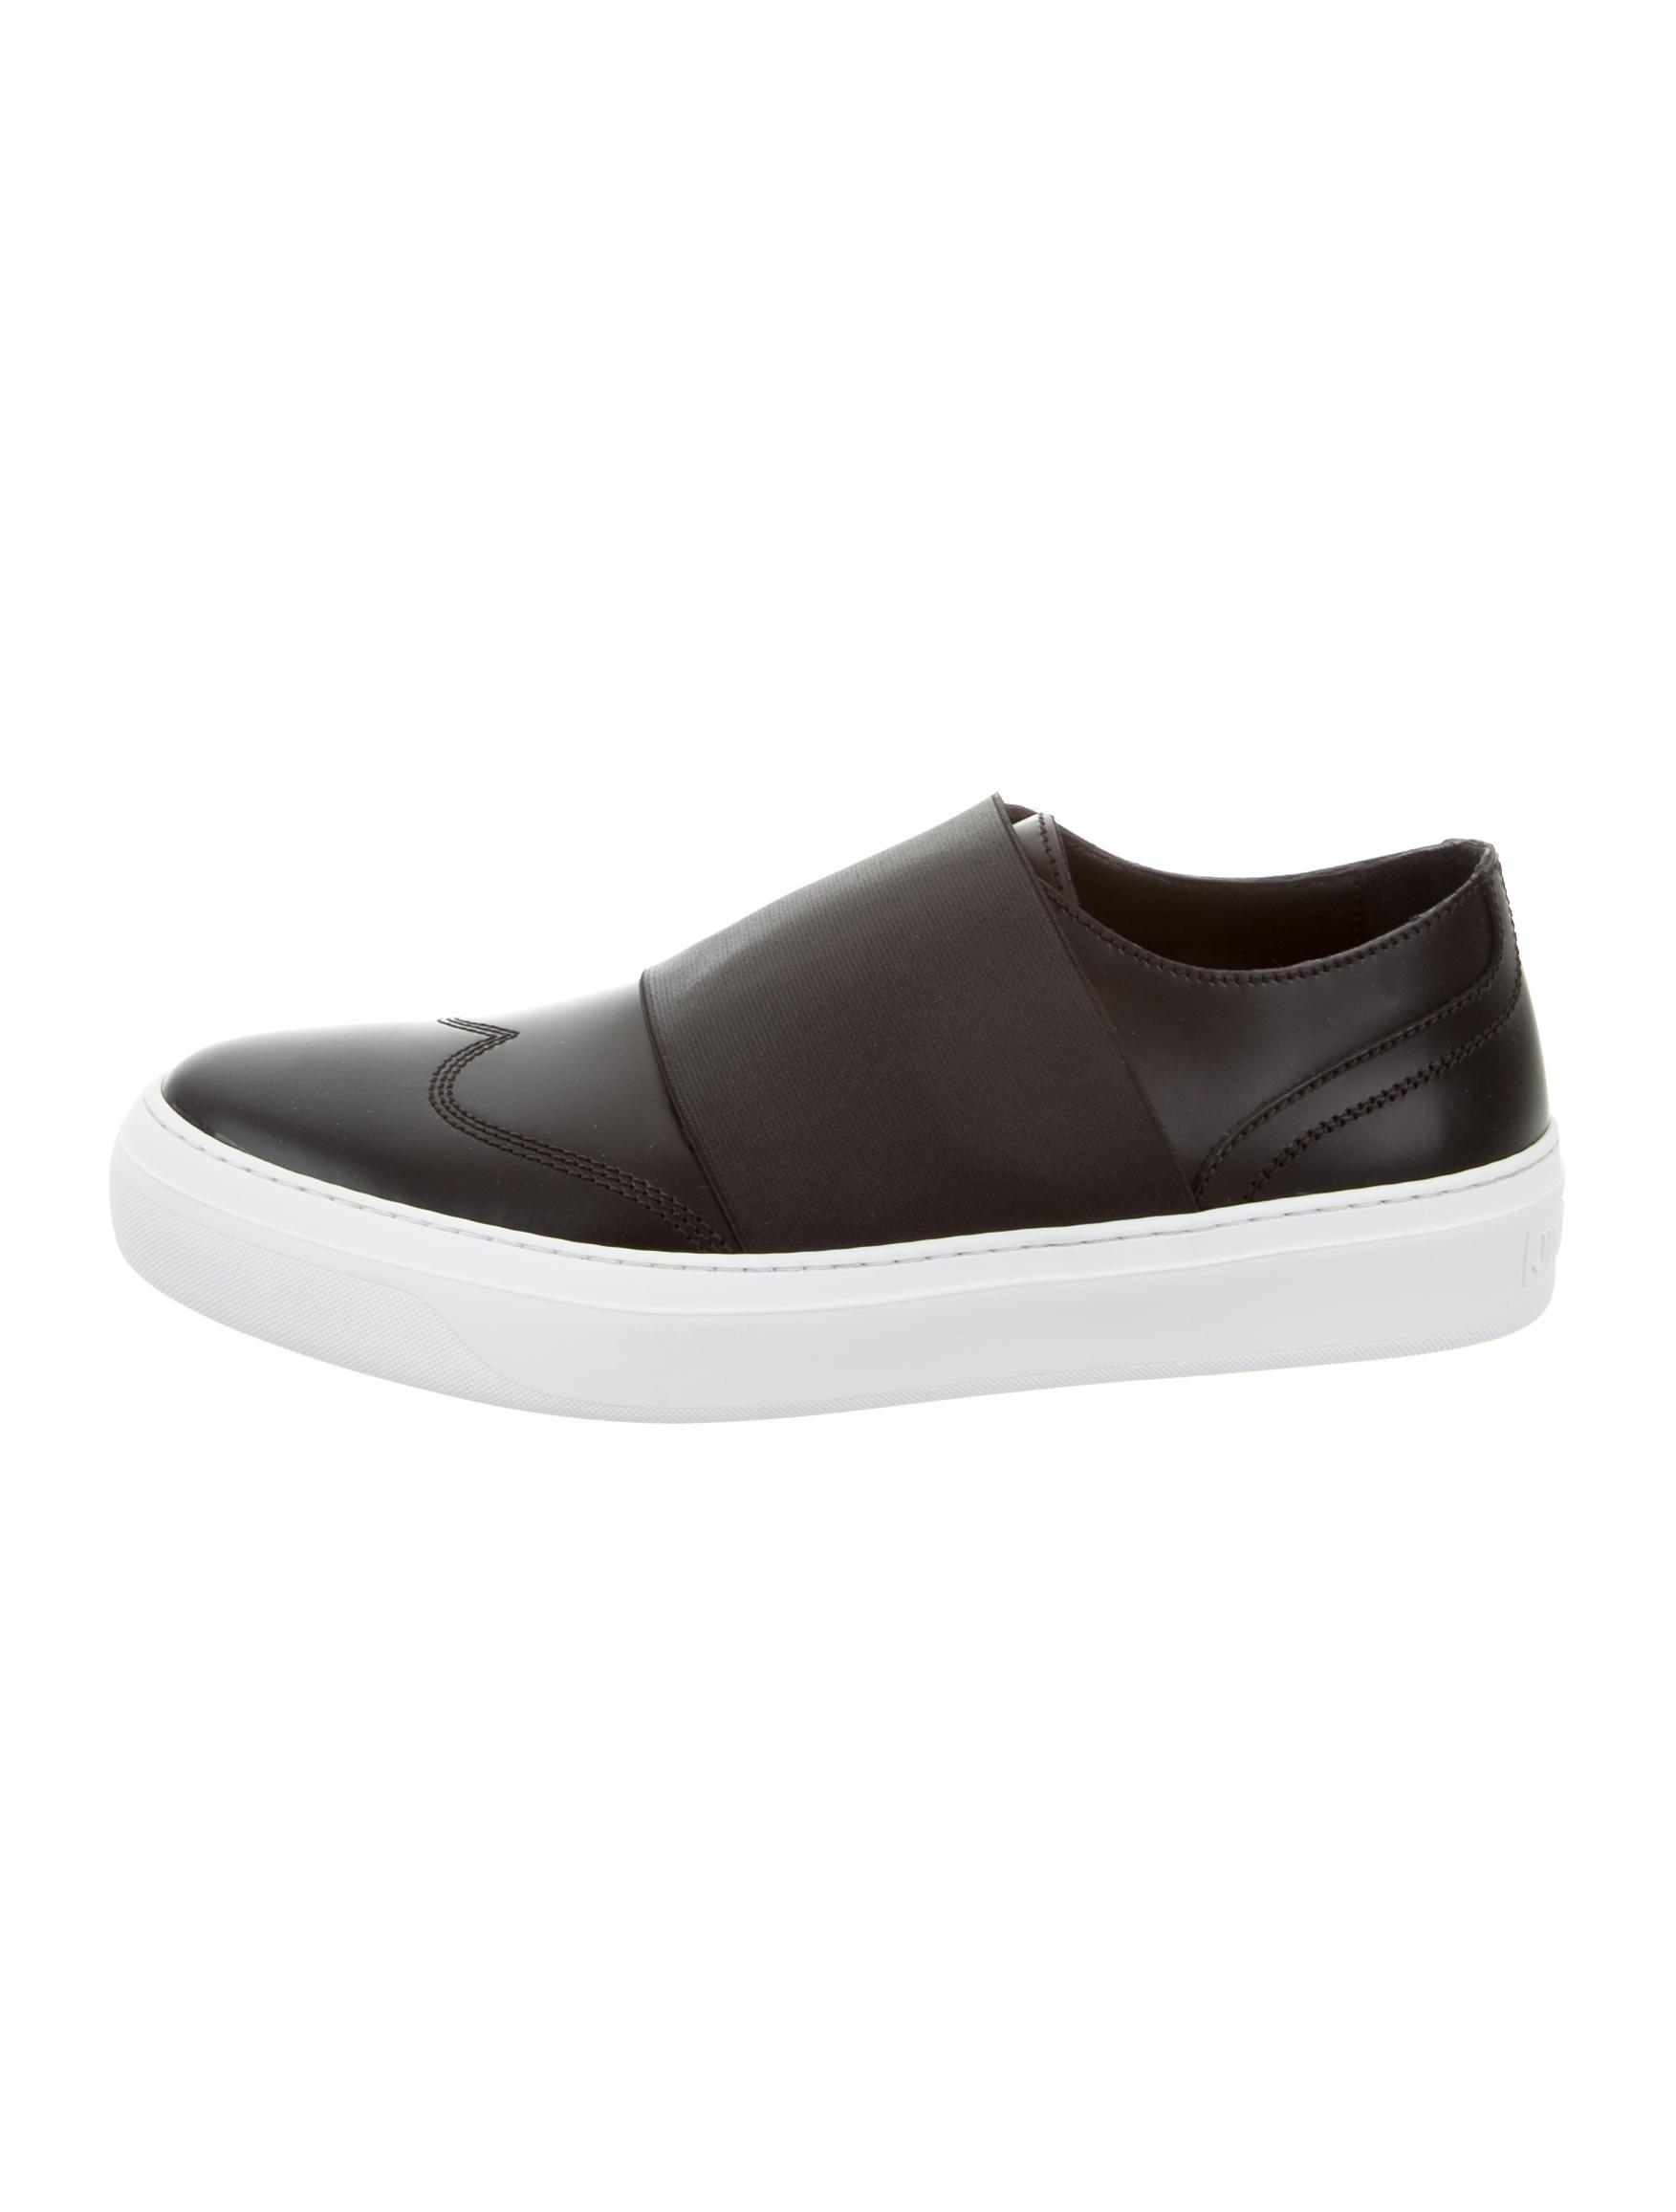 Jimmy chooLeather Guy Slip-On Sneakers lEIdj2xe8